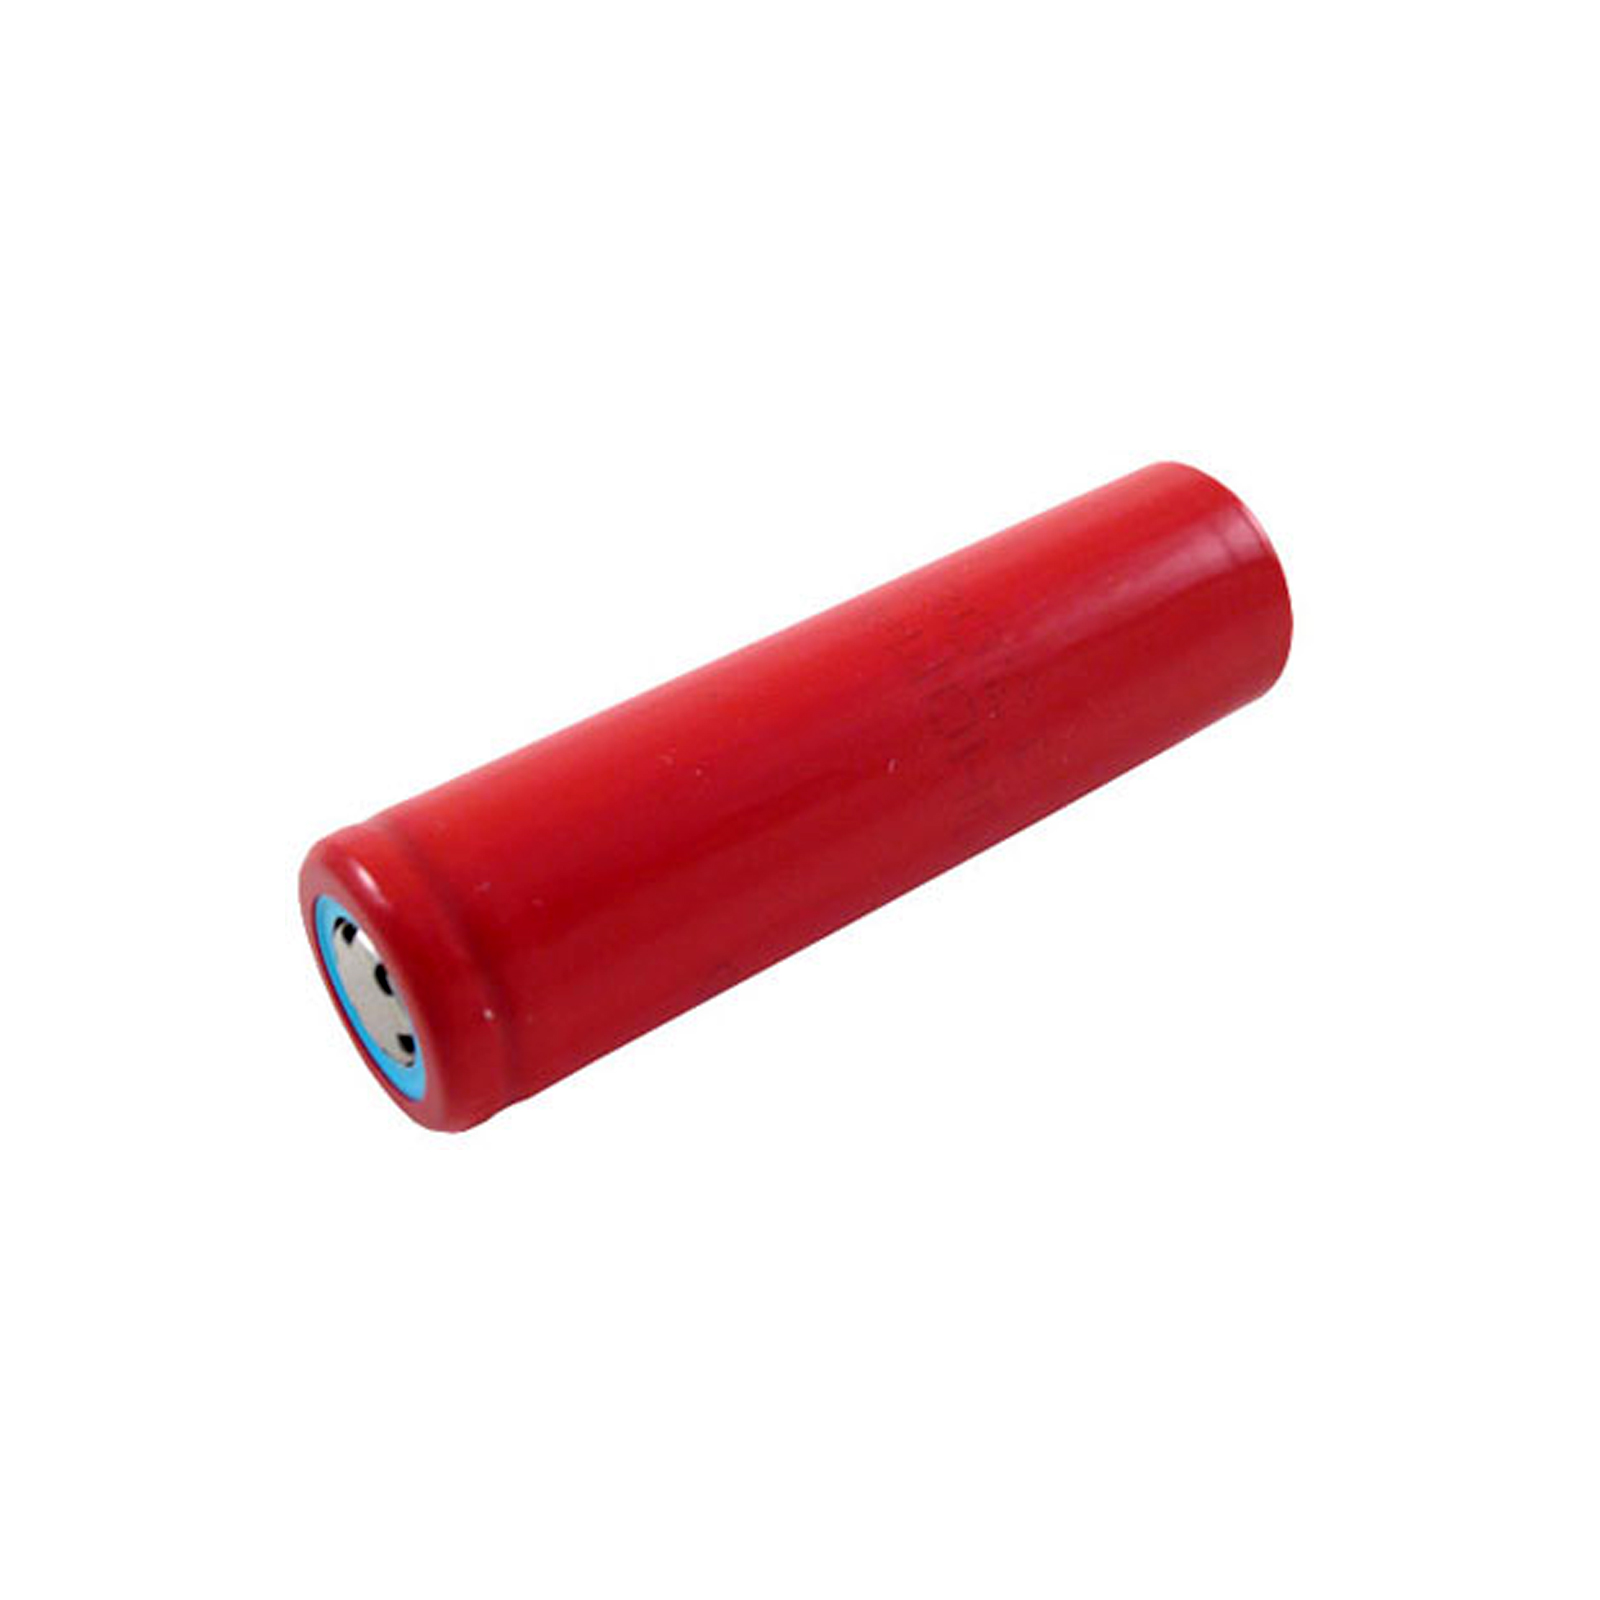 UltraFire Batteries  Buy Original UltraFire Batteries